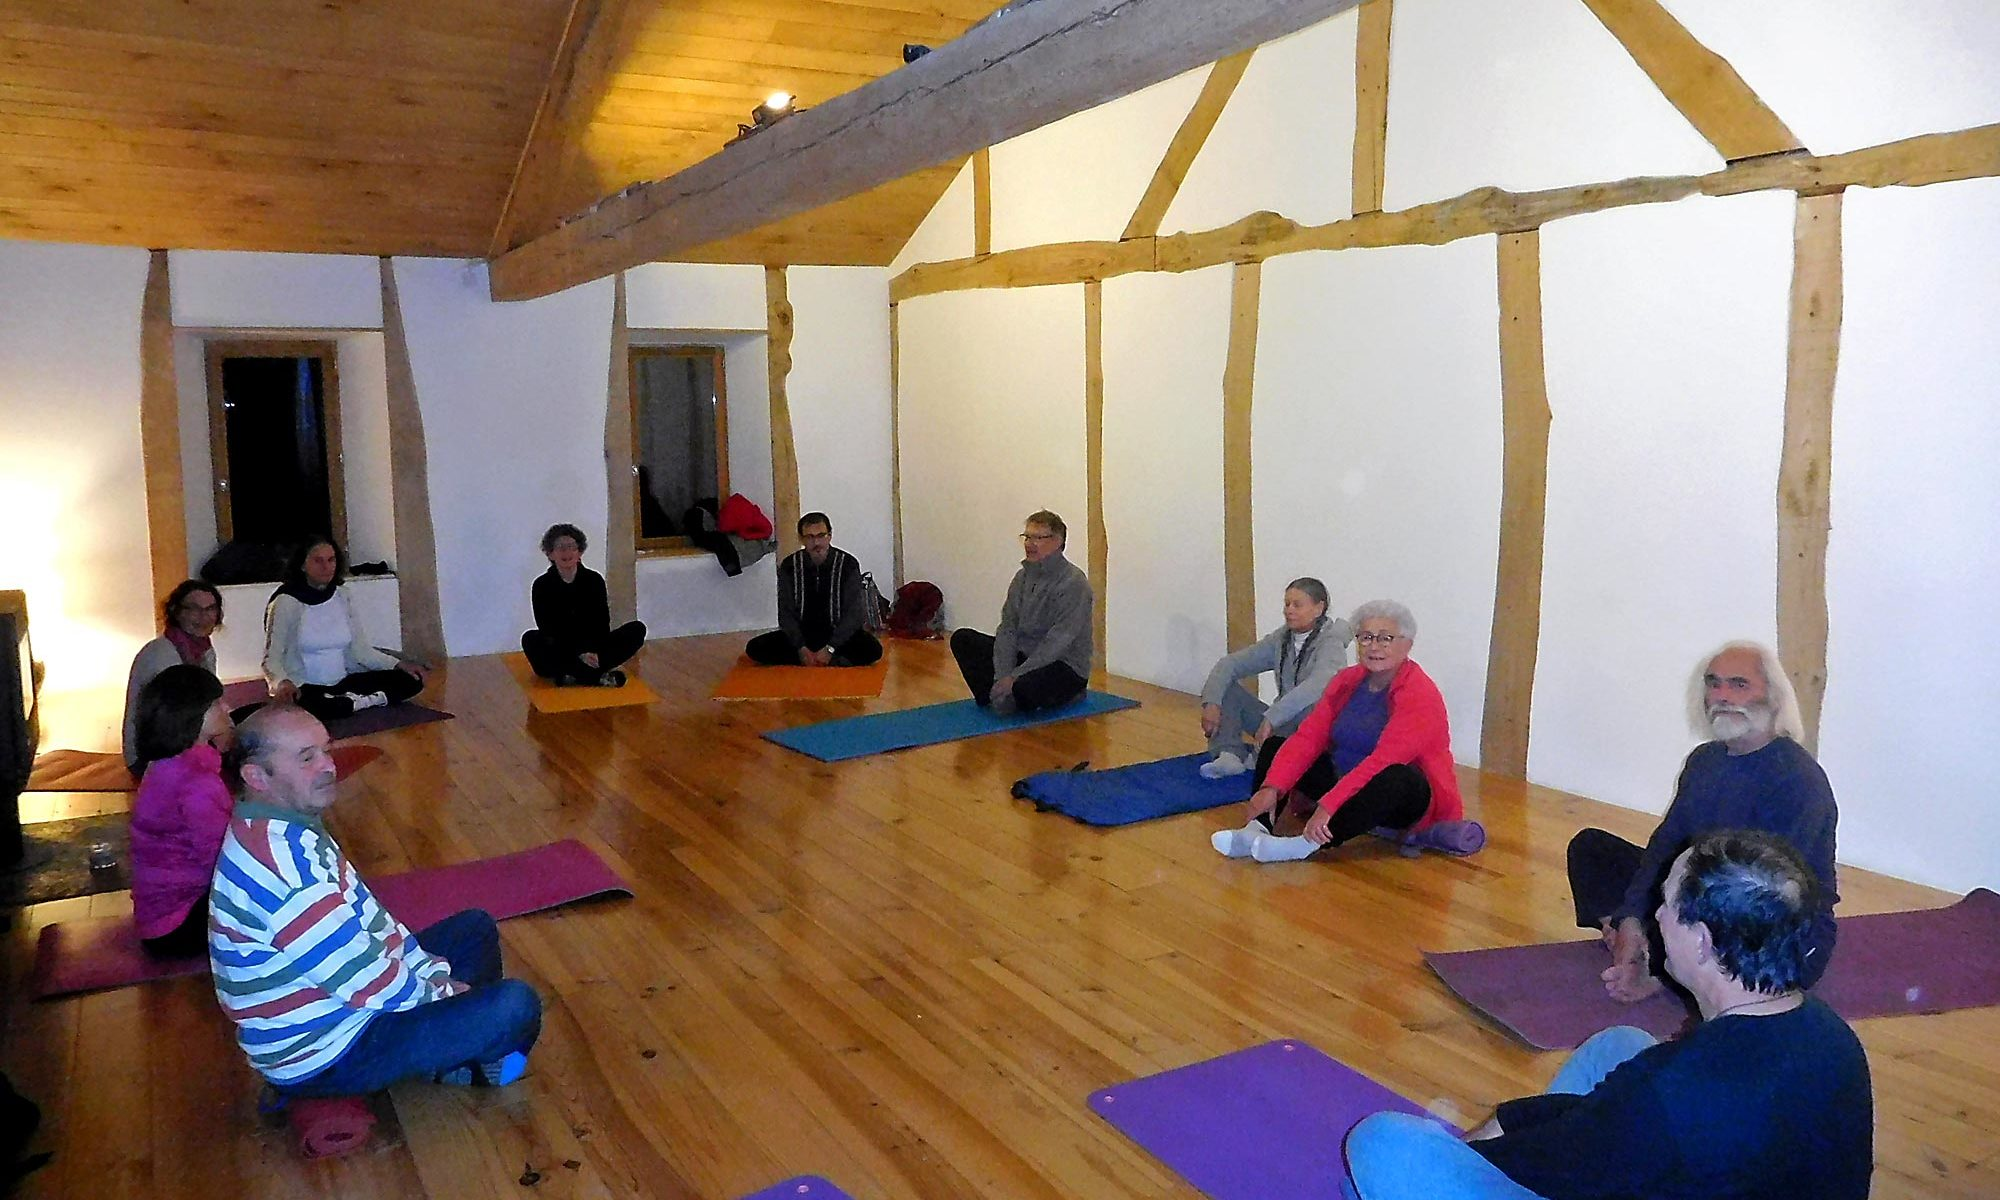 salle yogadanse roquecave